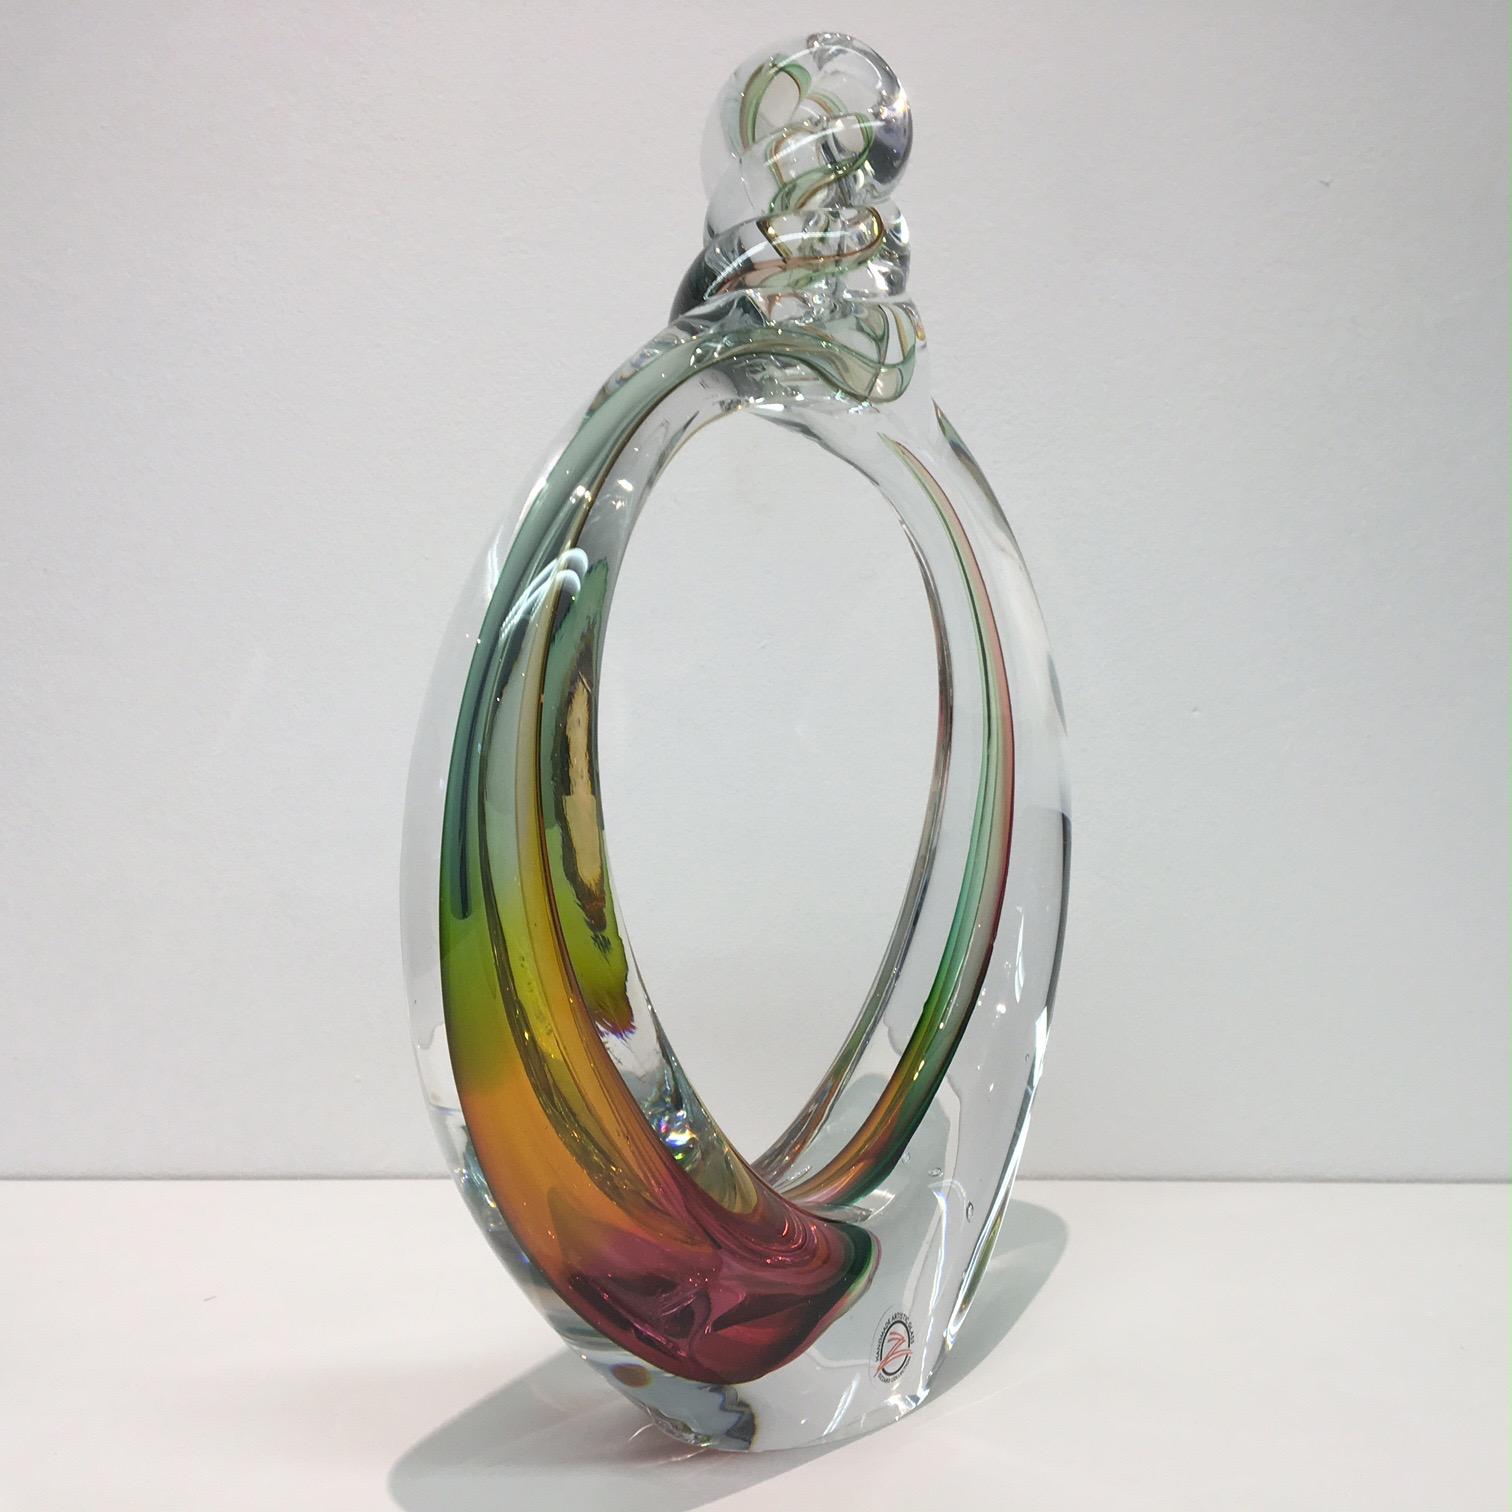 Loranto kristal 'Ring'